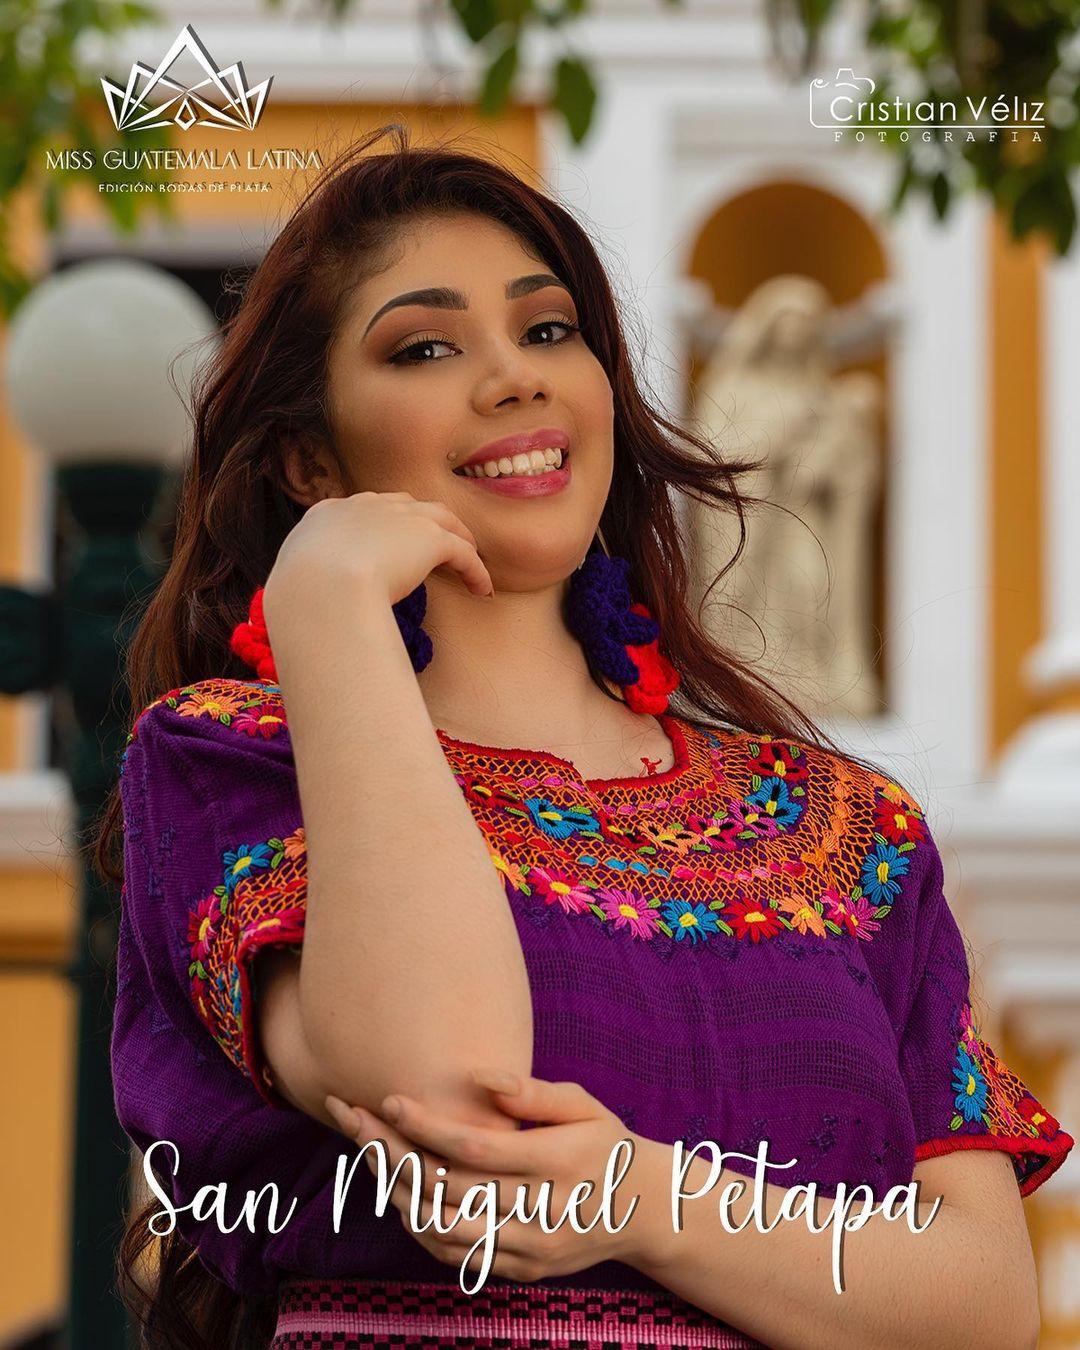 candidatas a miss guatemala latina 2021. final: 30 de abril. - Página 2 B2gmYl